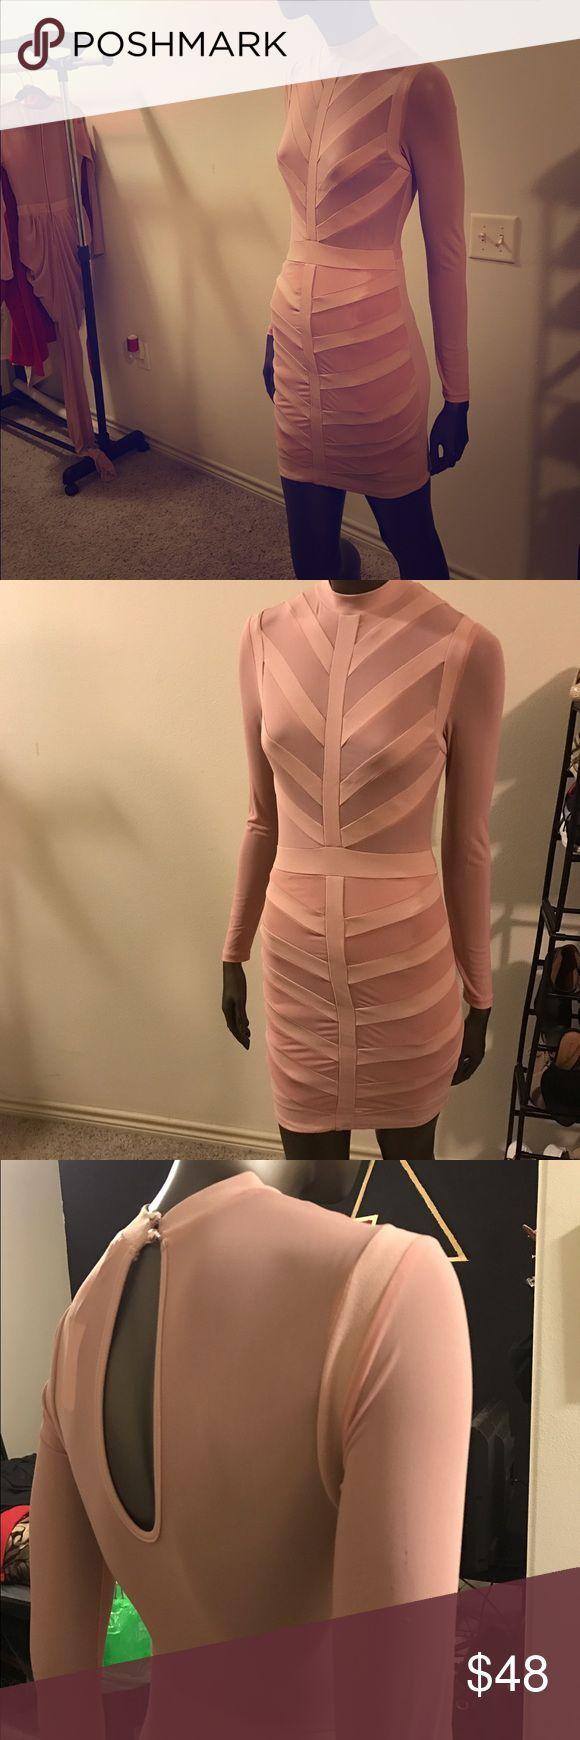 Salmon pink bandage dress Pink bandage dress WINDSOR Dresses Long Sleeve